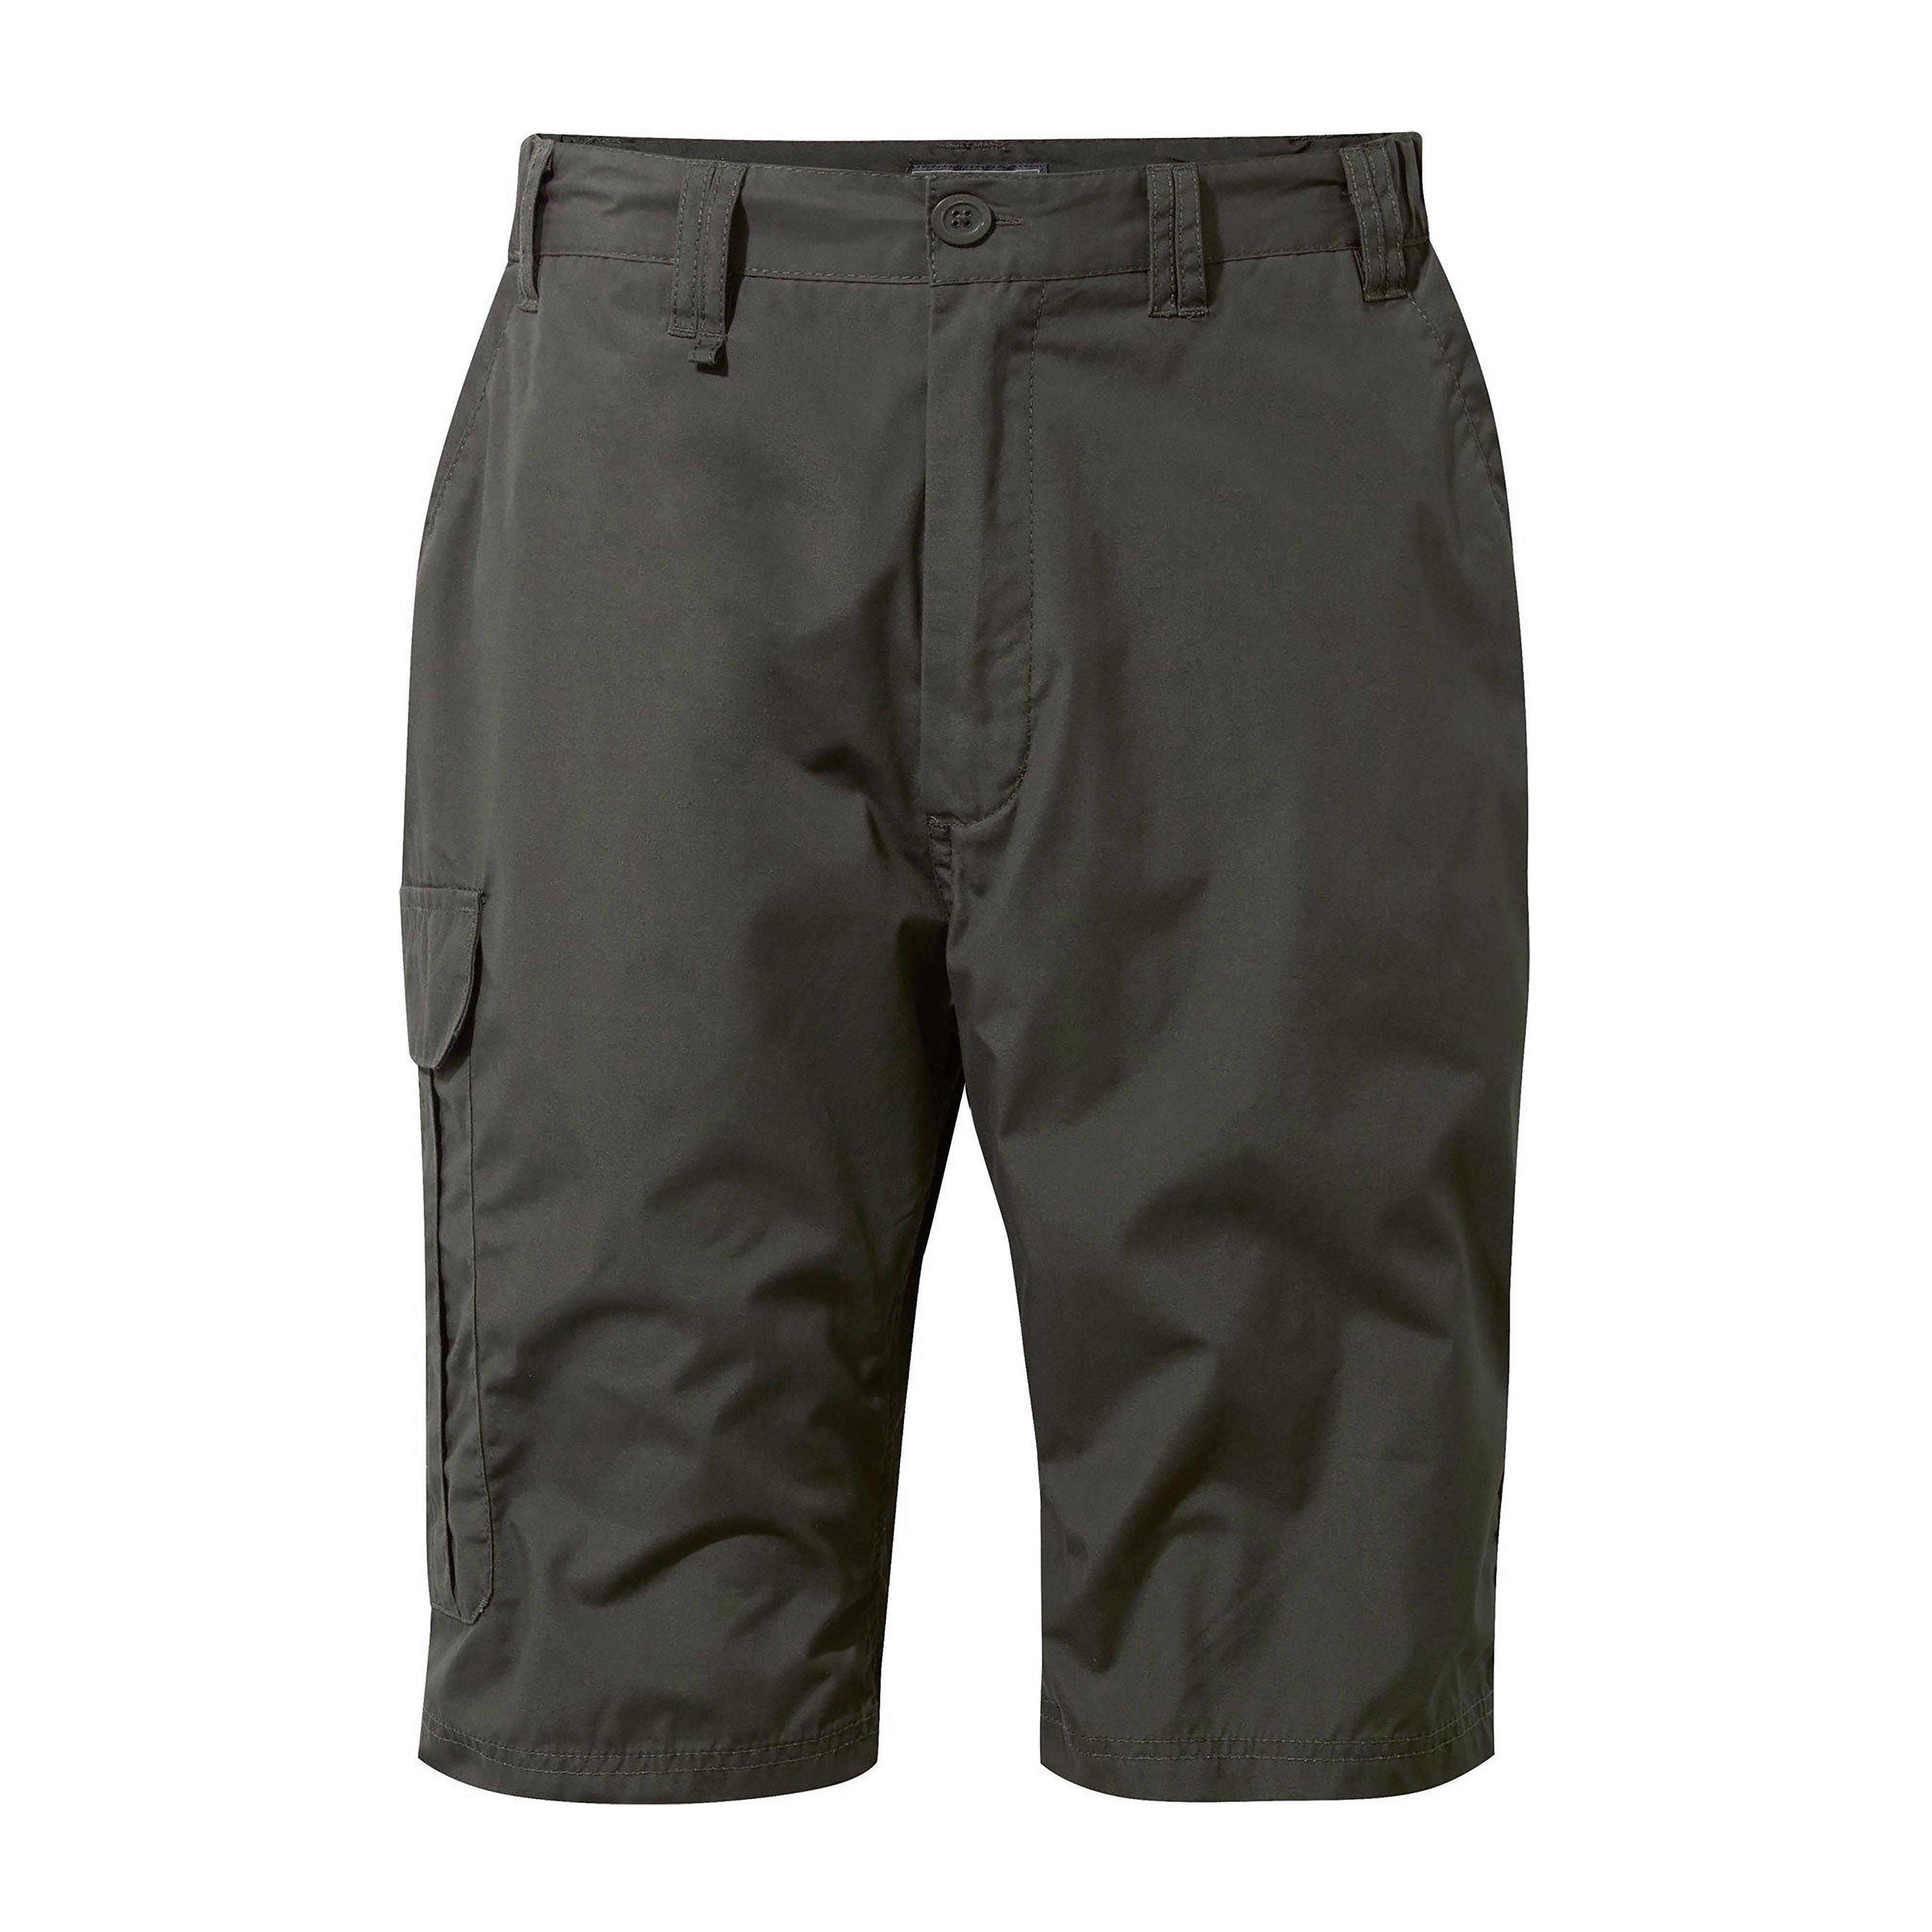 Craghoppers Mens Kiwi Long Shorts Brown